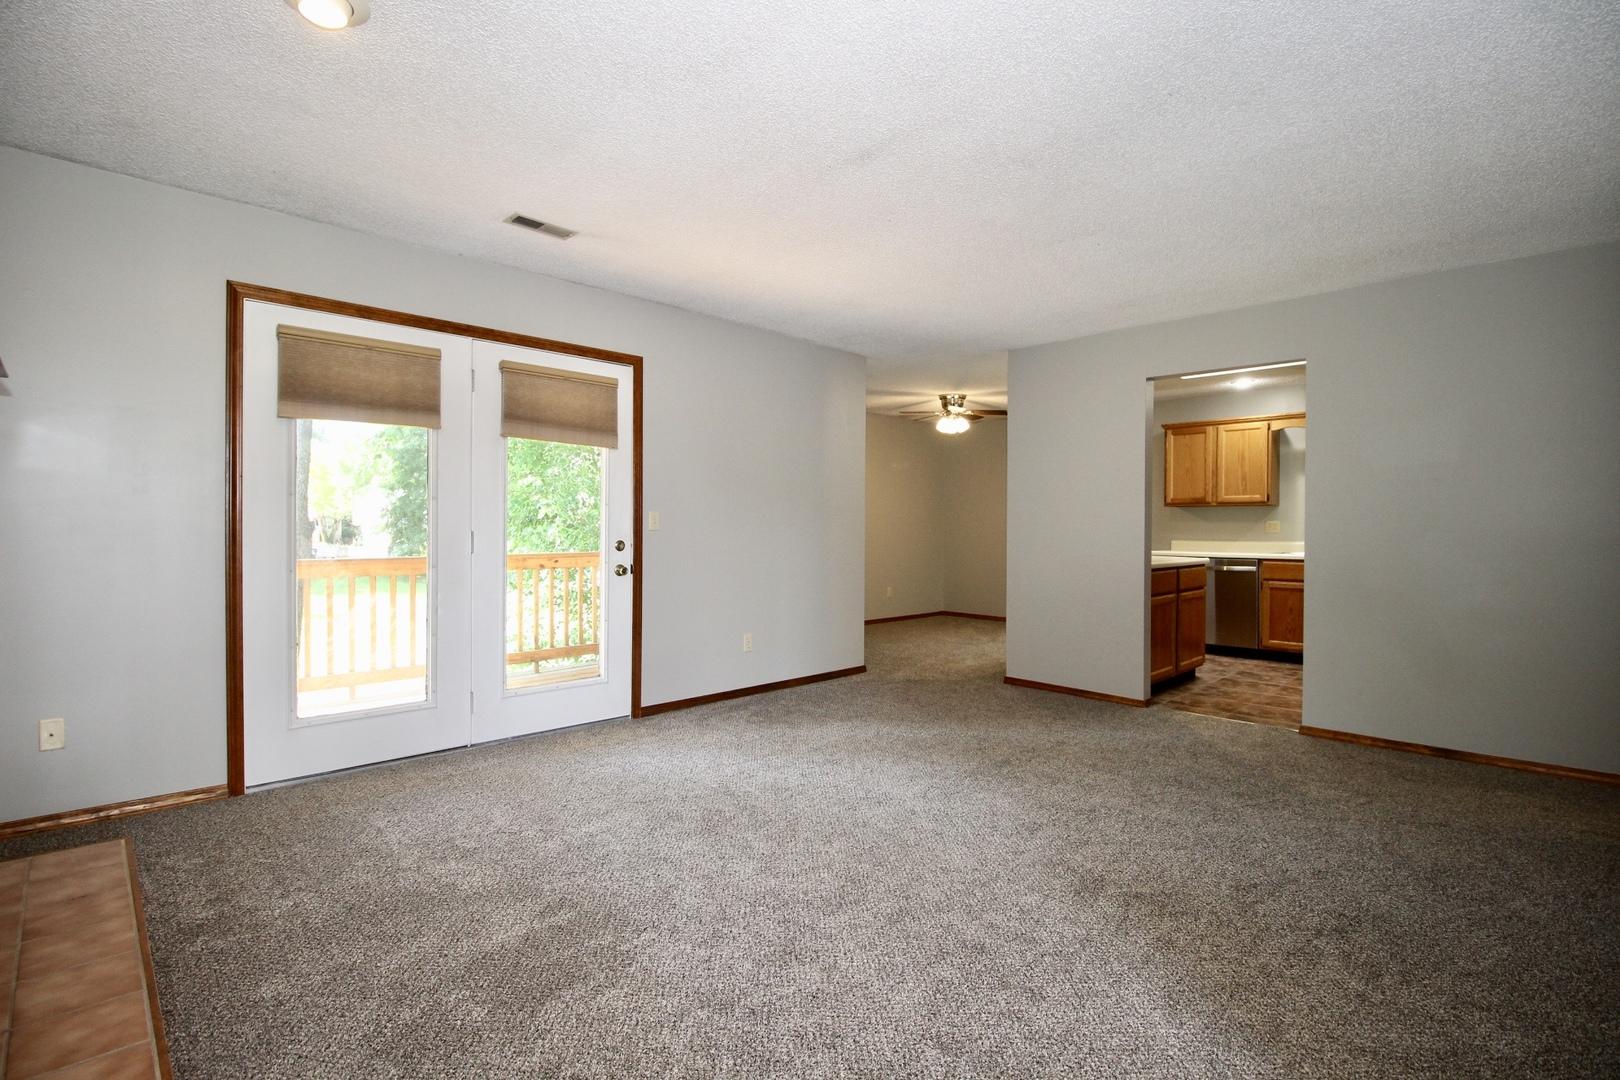 903 North Linden 125, NORMAL, Illinois, 61761